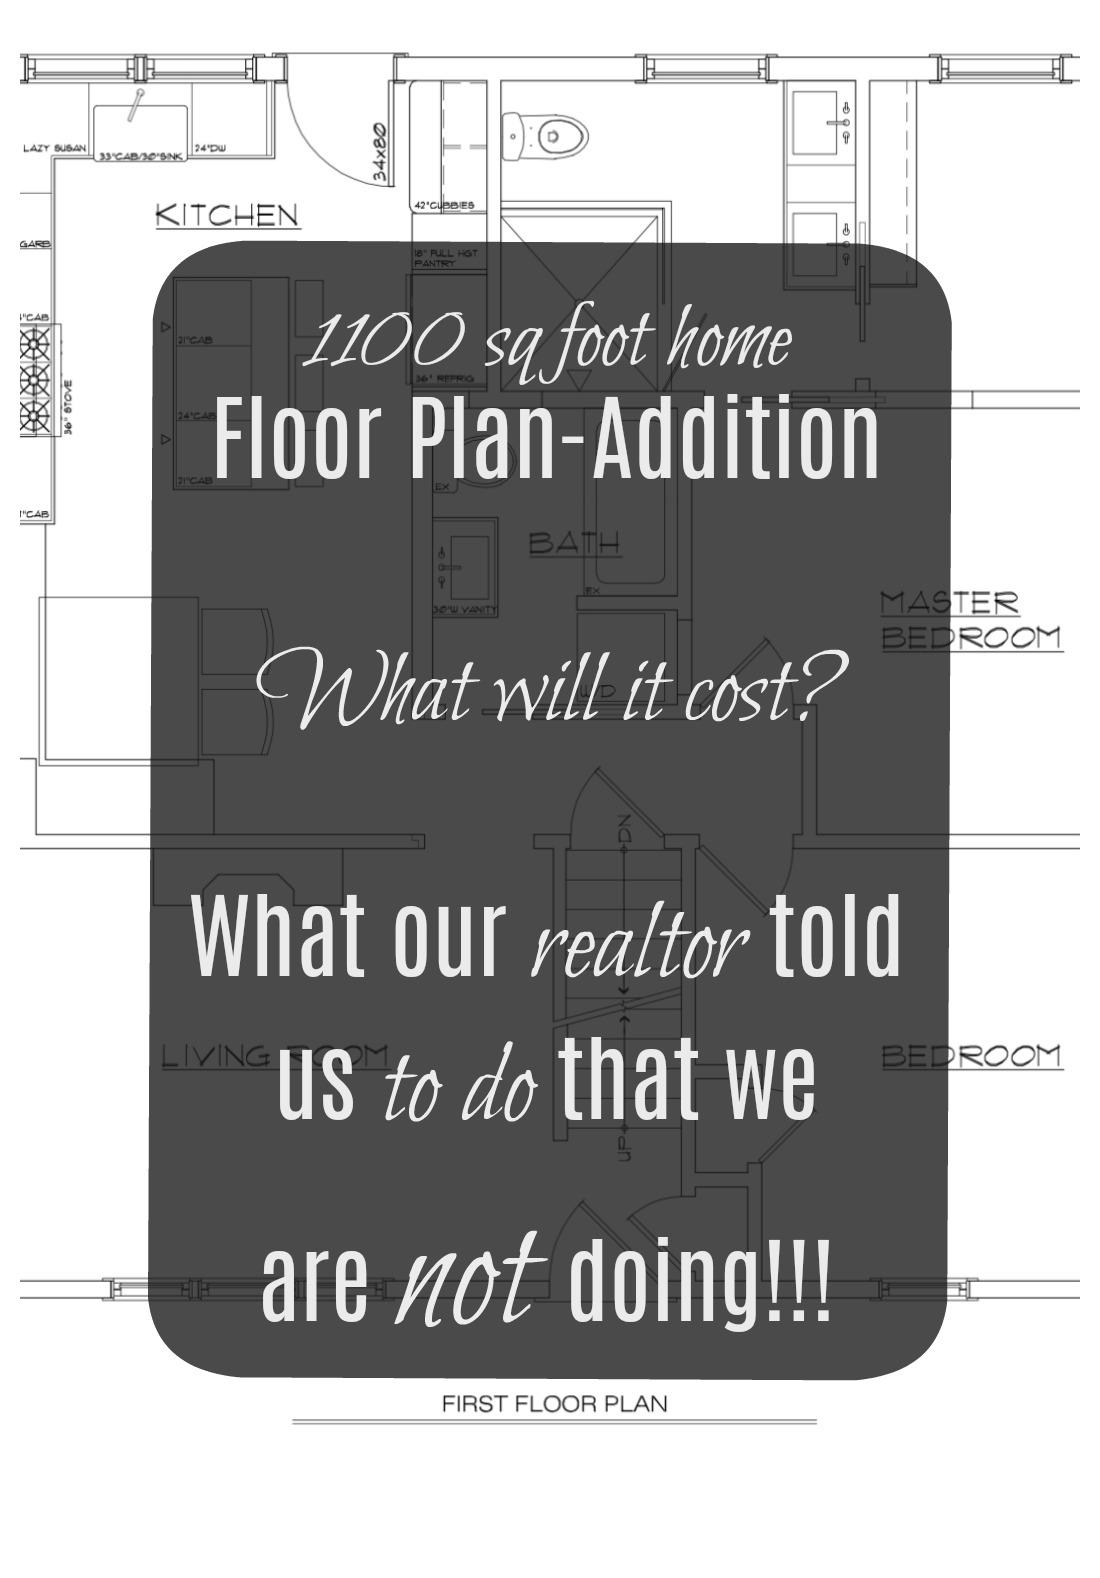 1100 sq foot- Floor Plan Addition